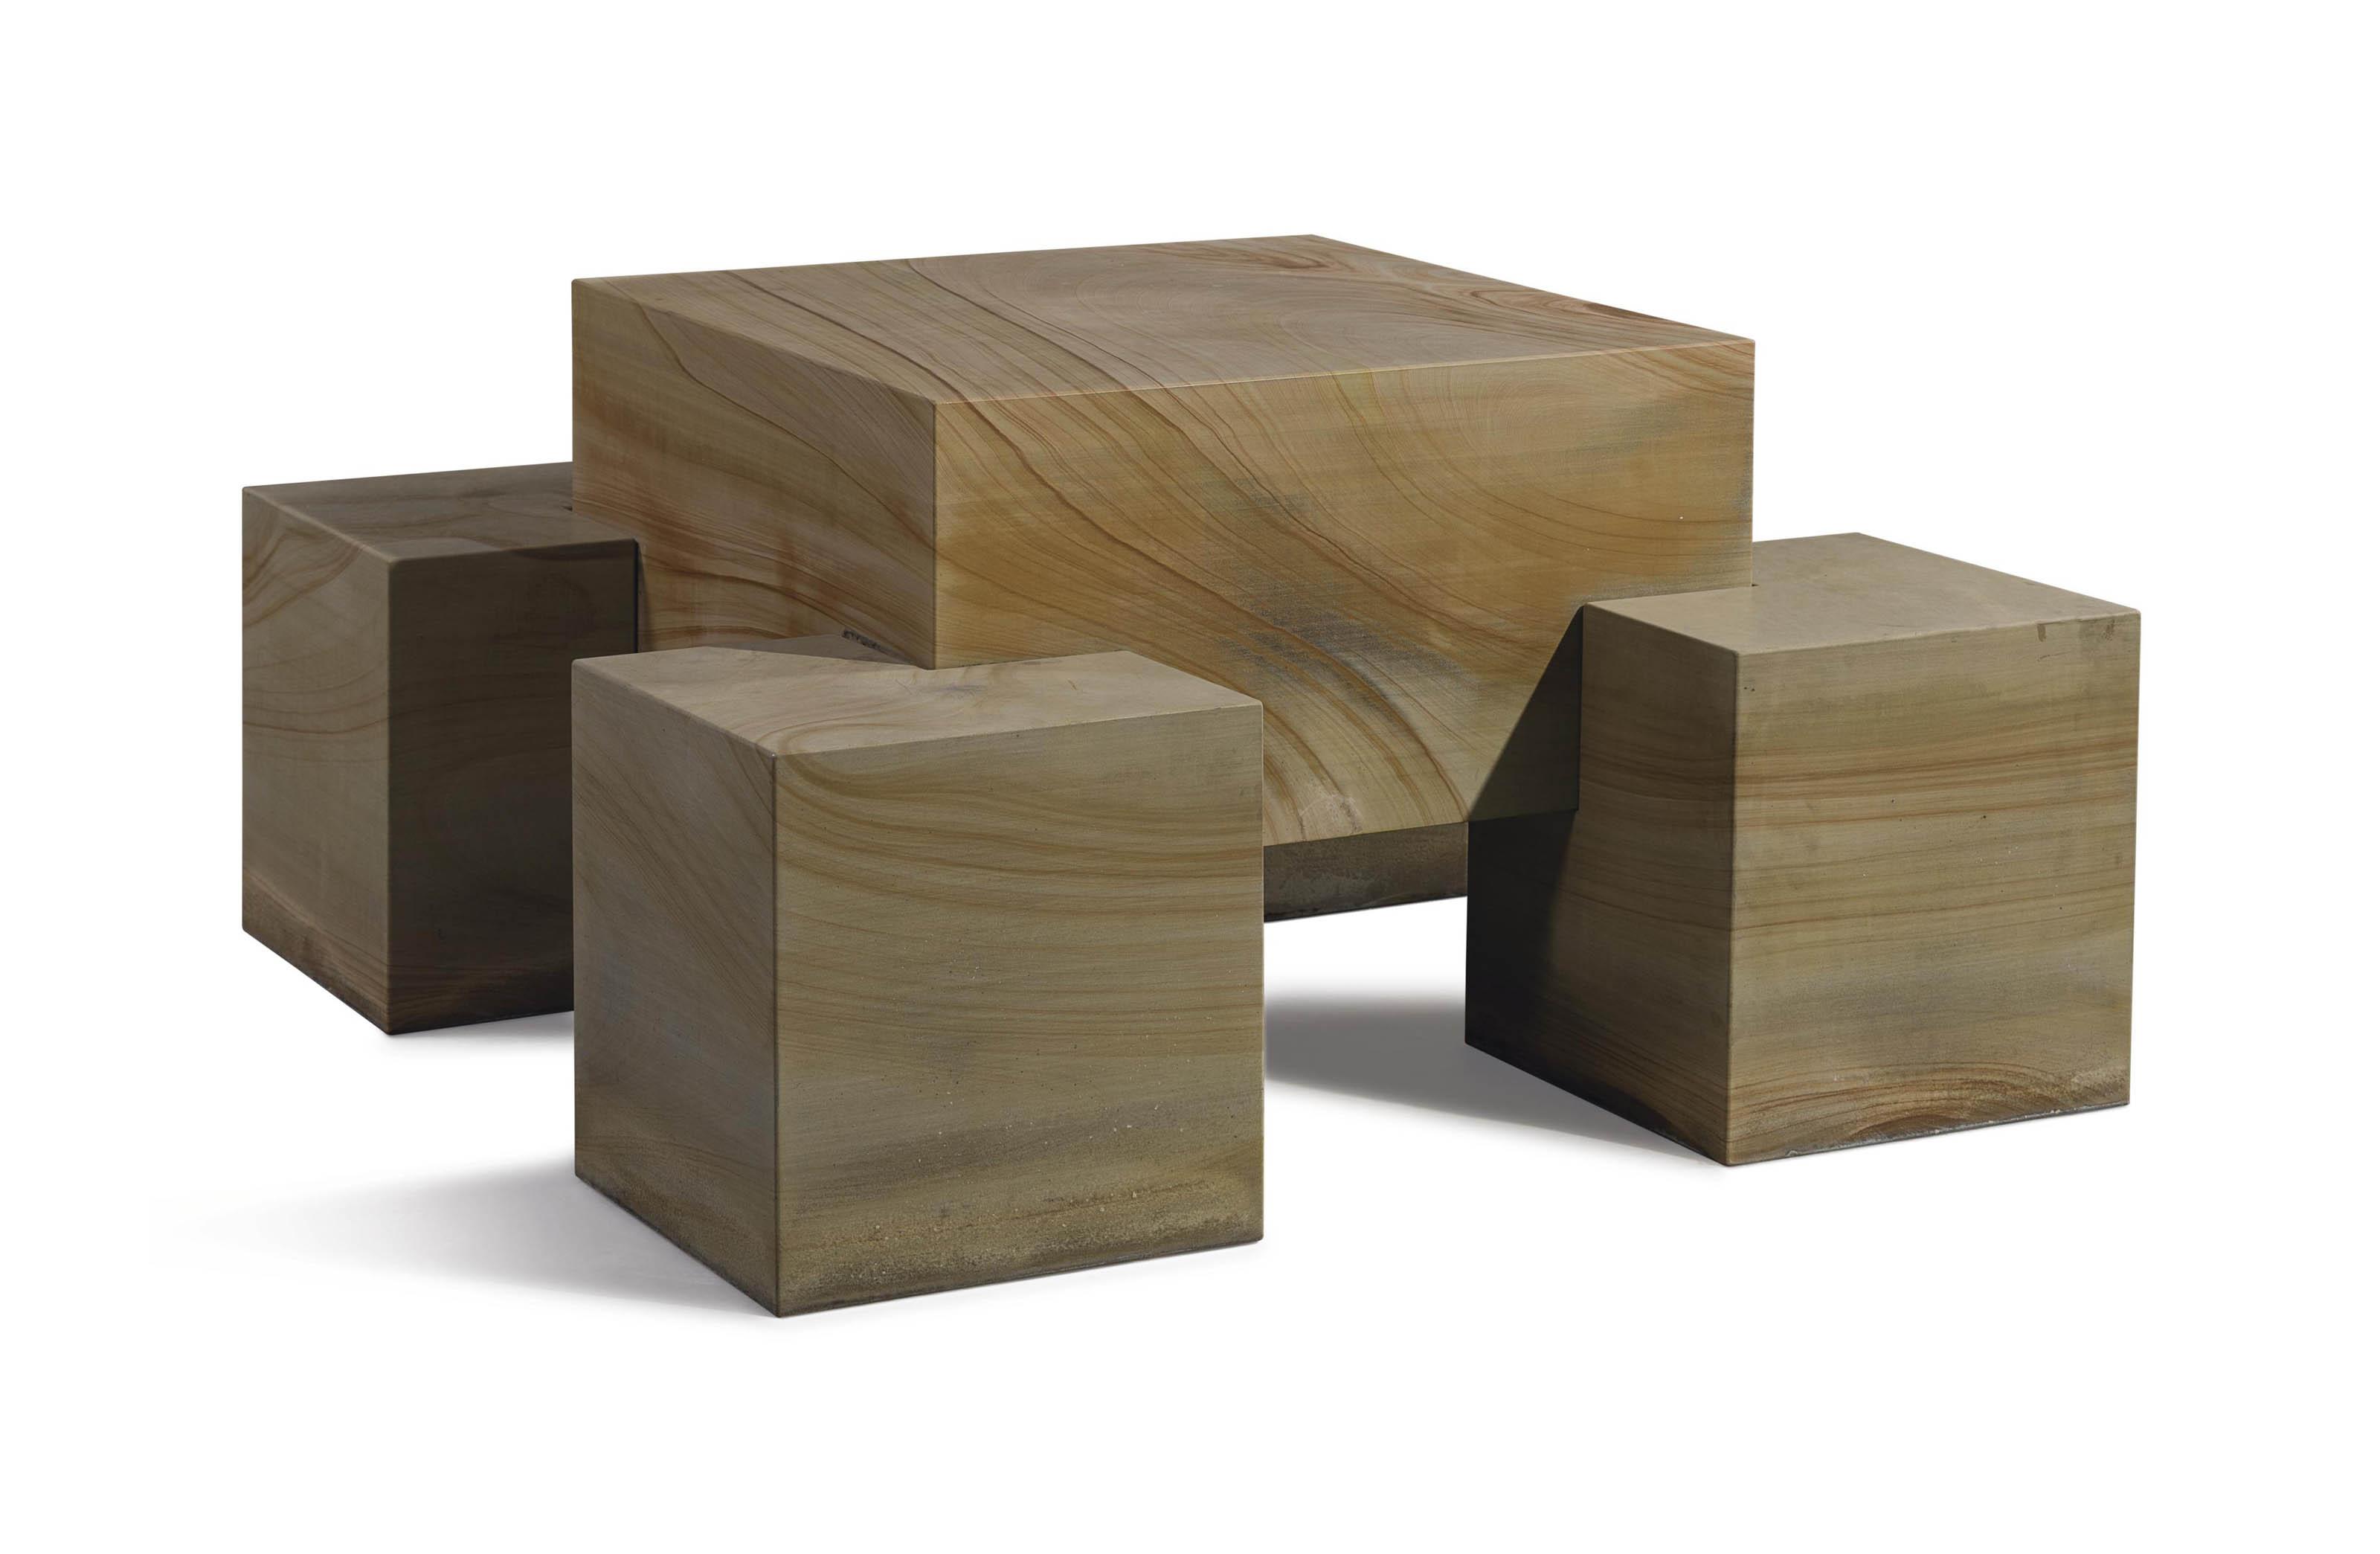 Seat-Leg Table